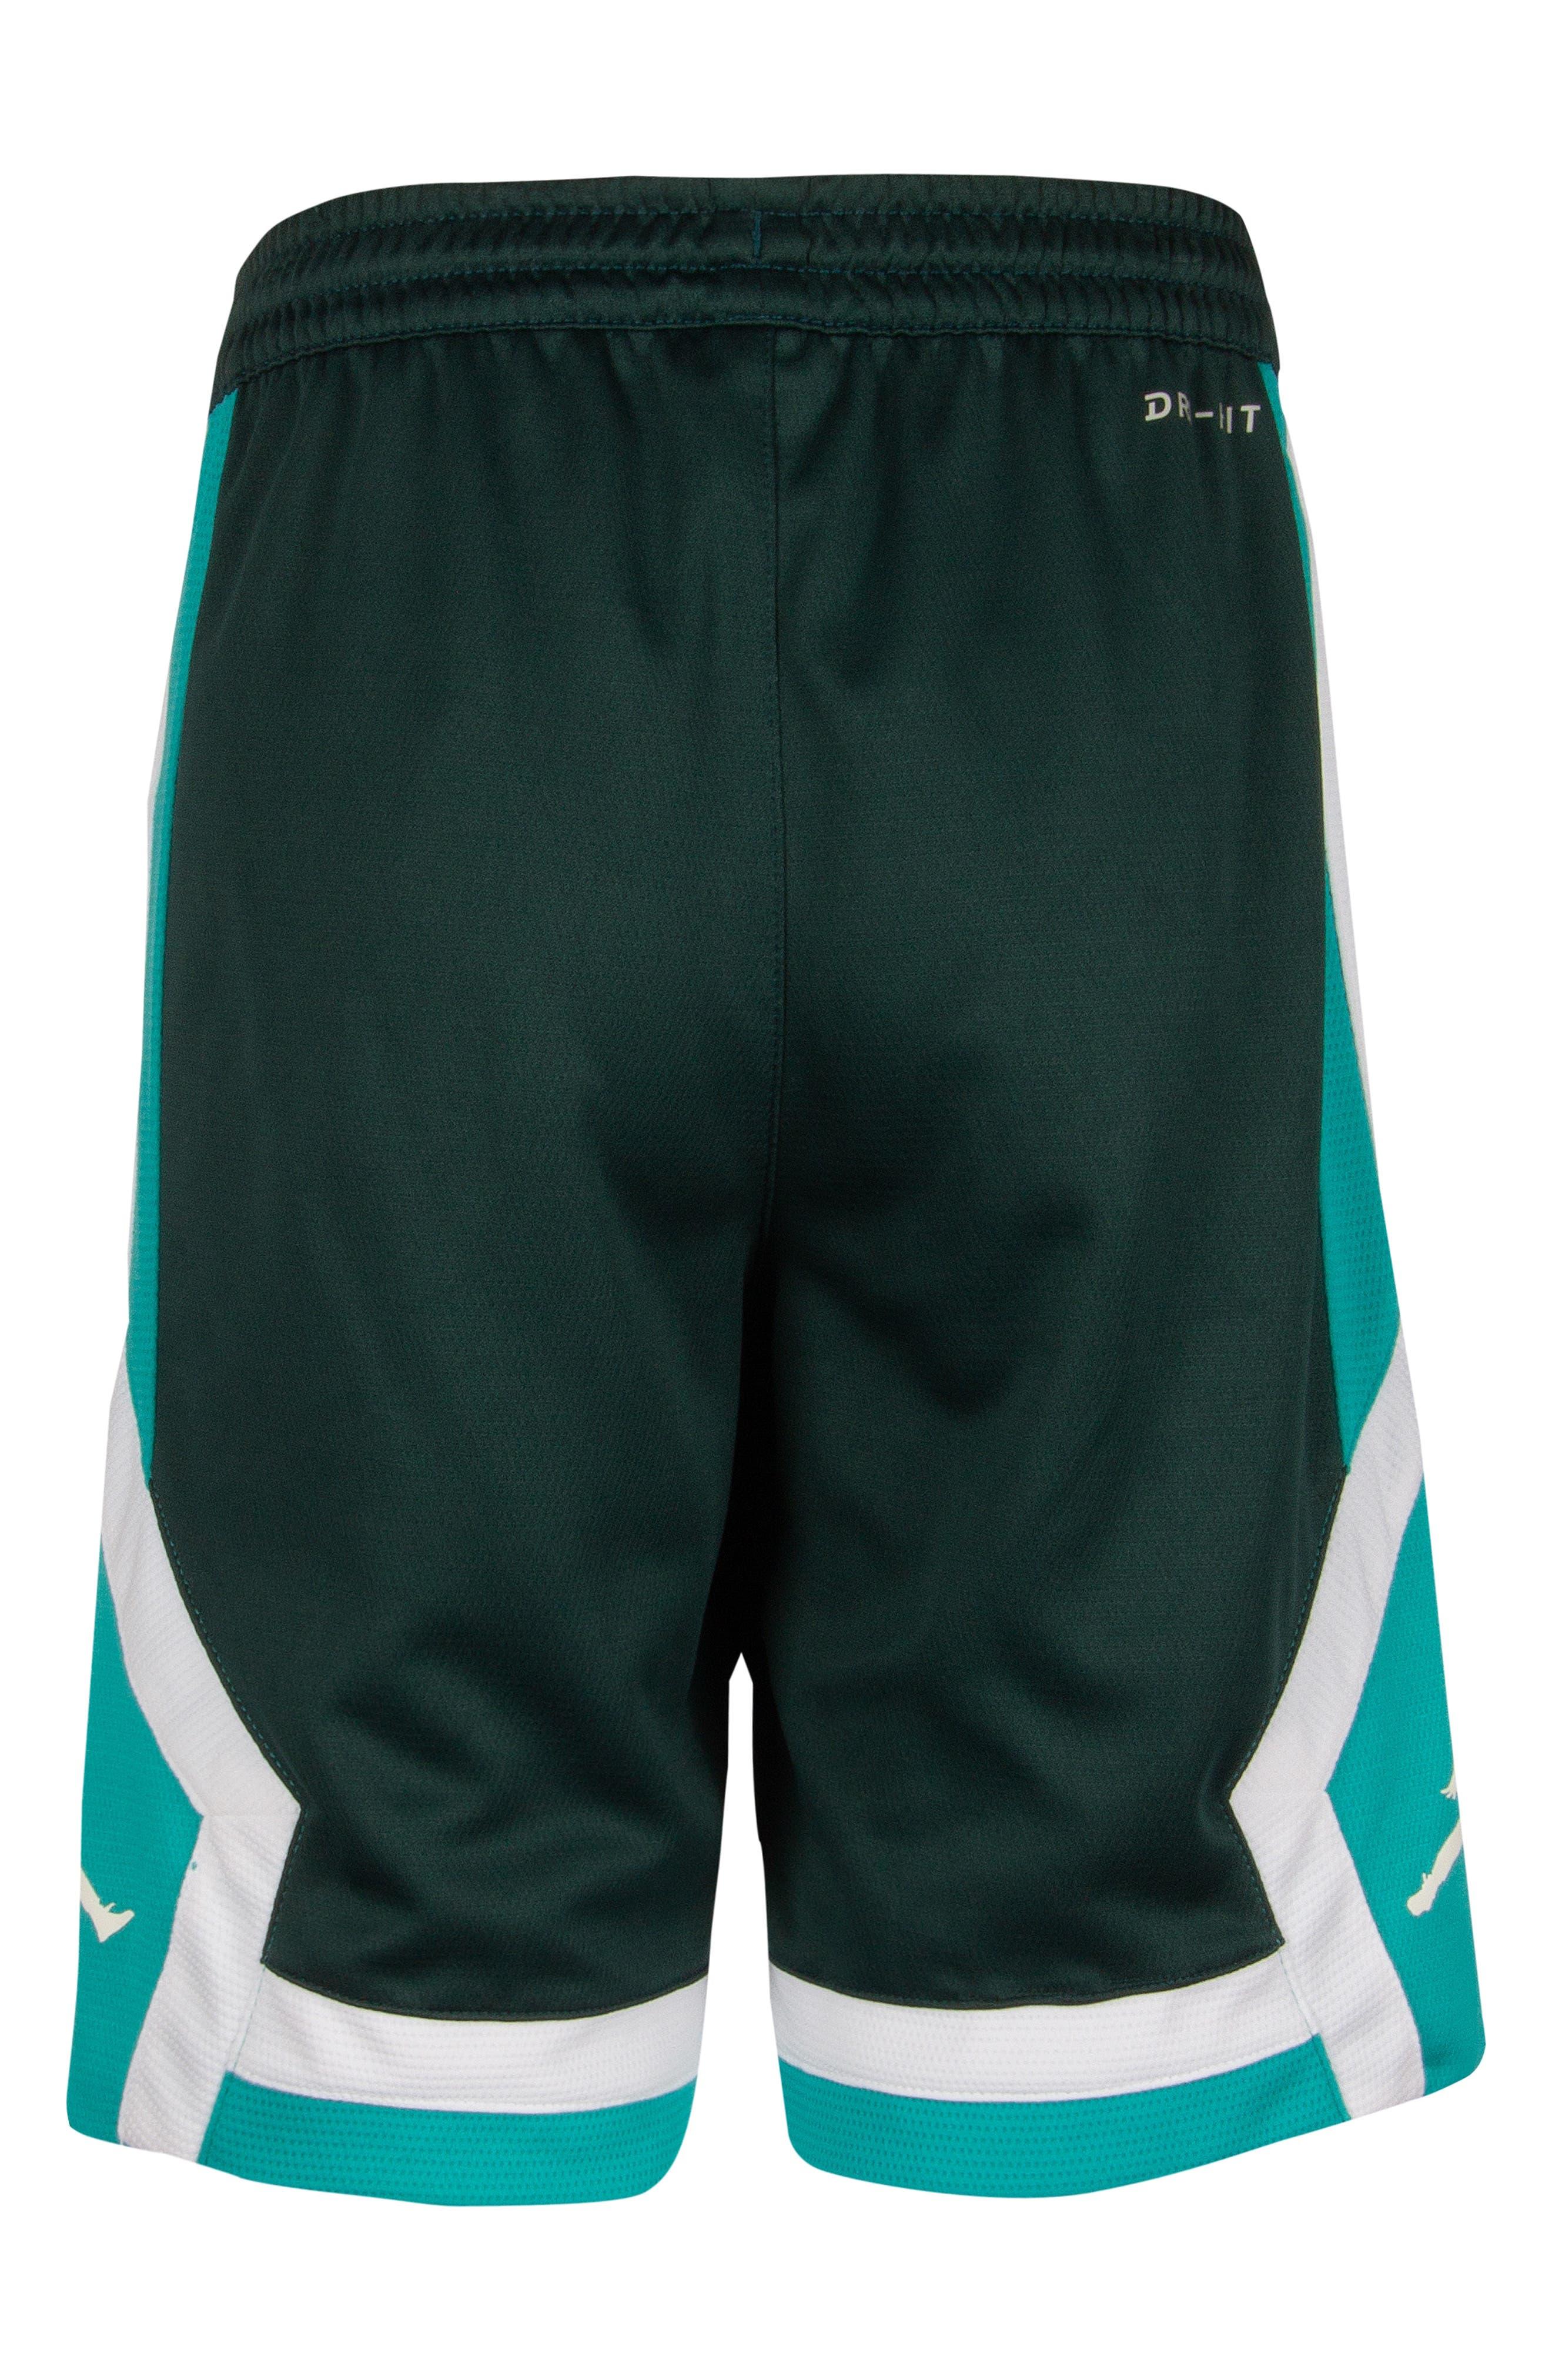 Jordan Rise Athletic Shorts,                             Alternate thumbnail 2, color,                             MIDNIGHT SPRUCE